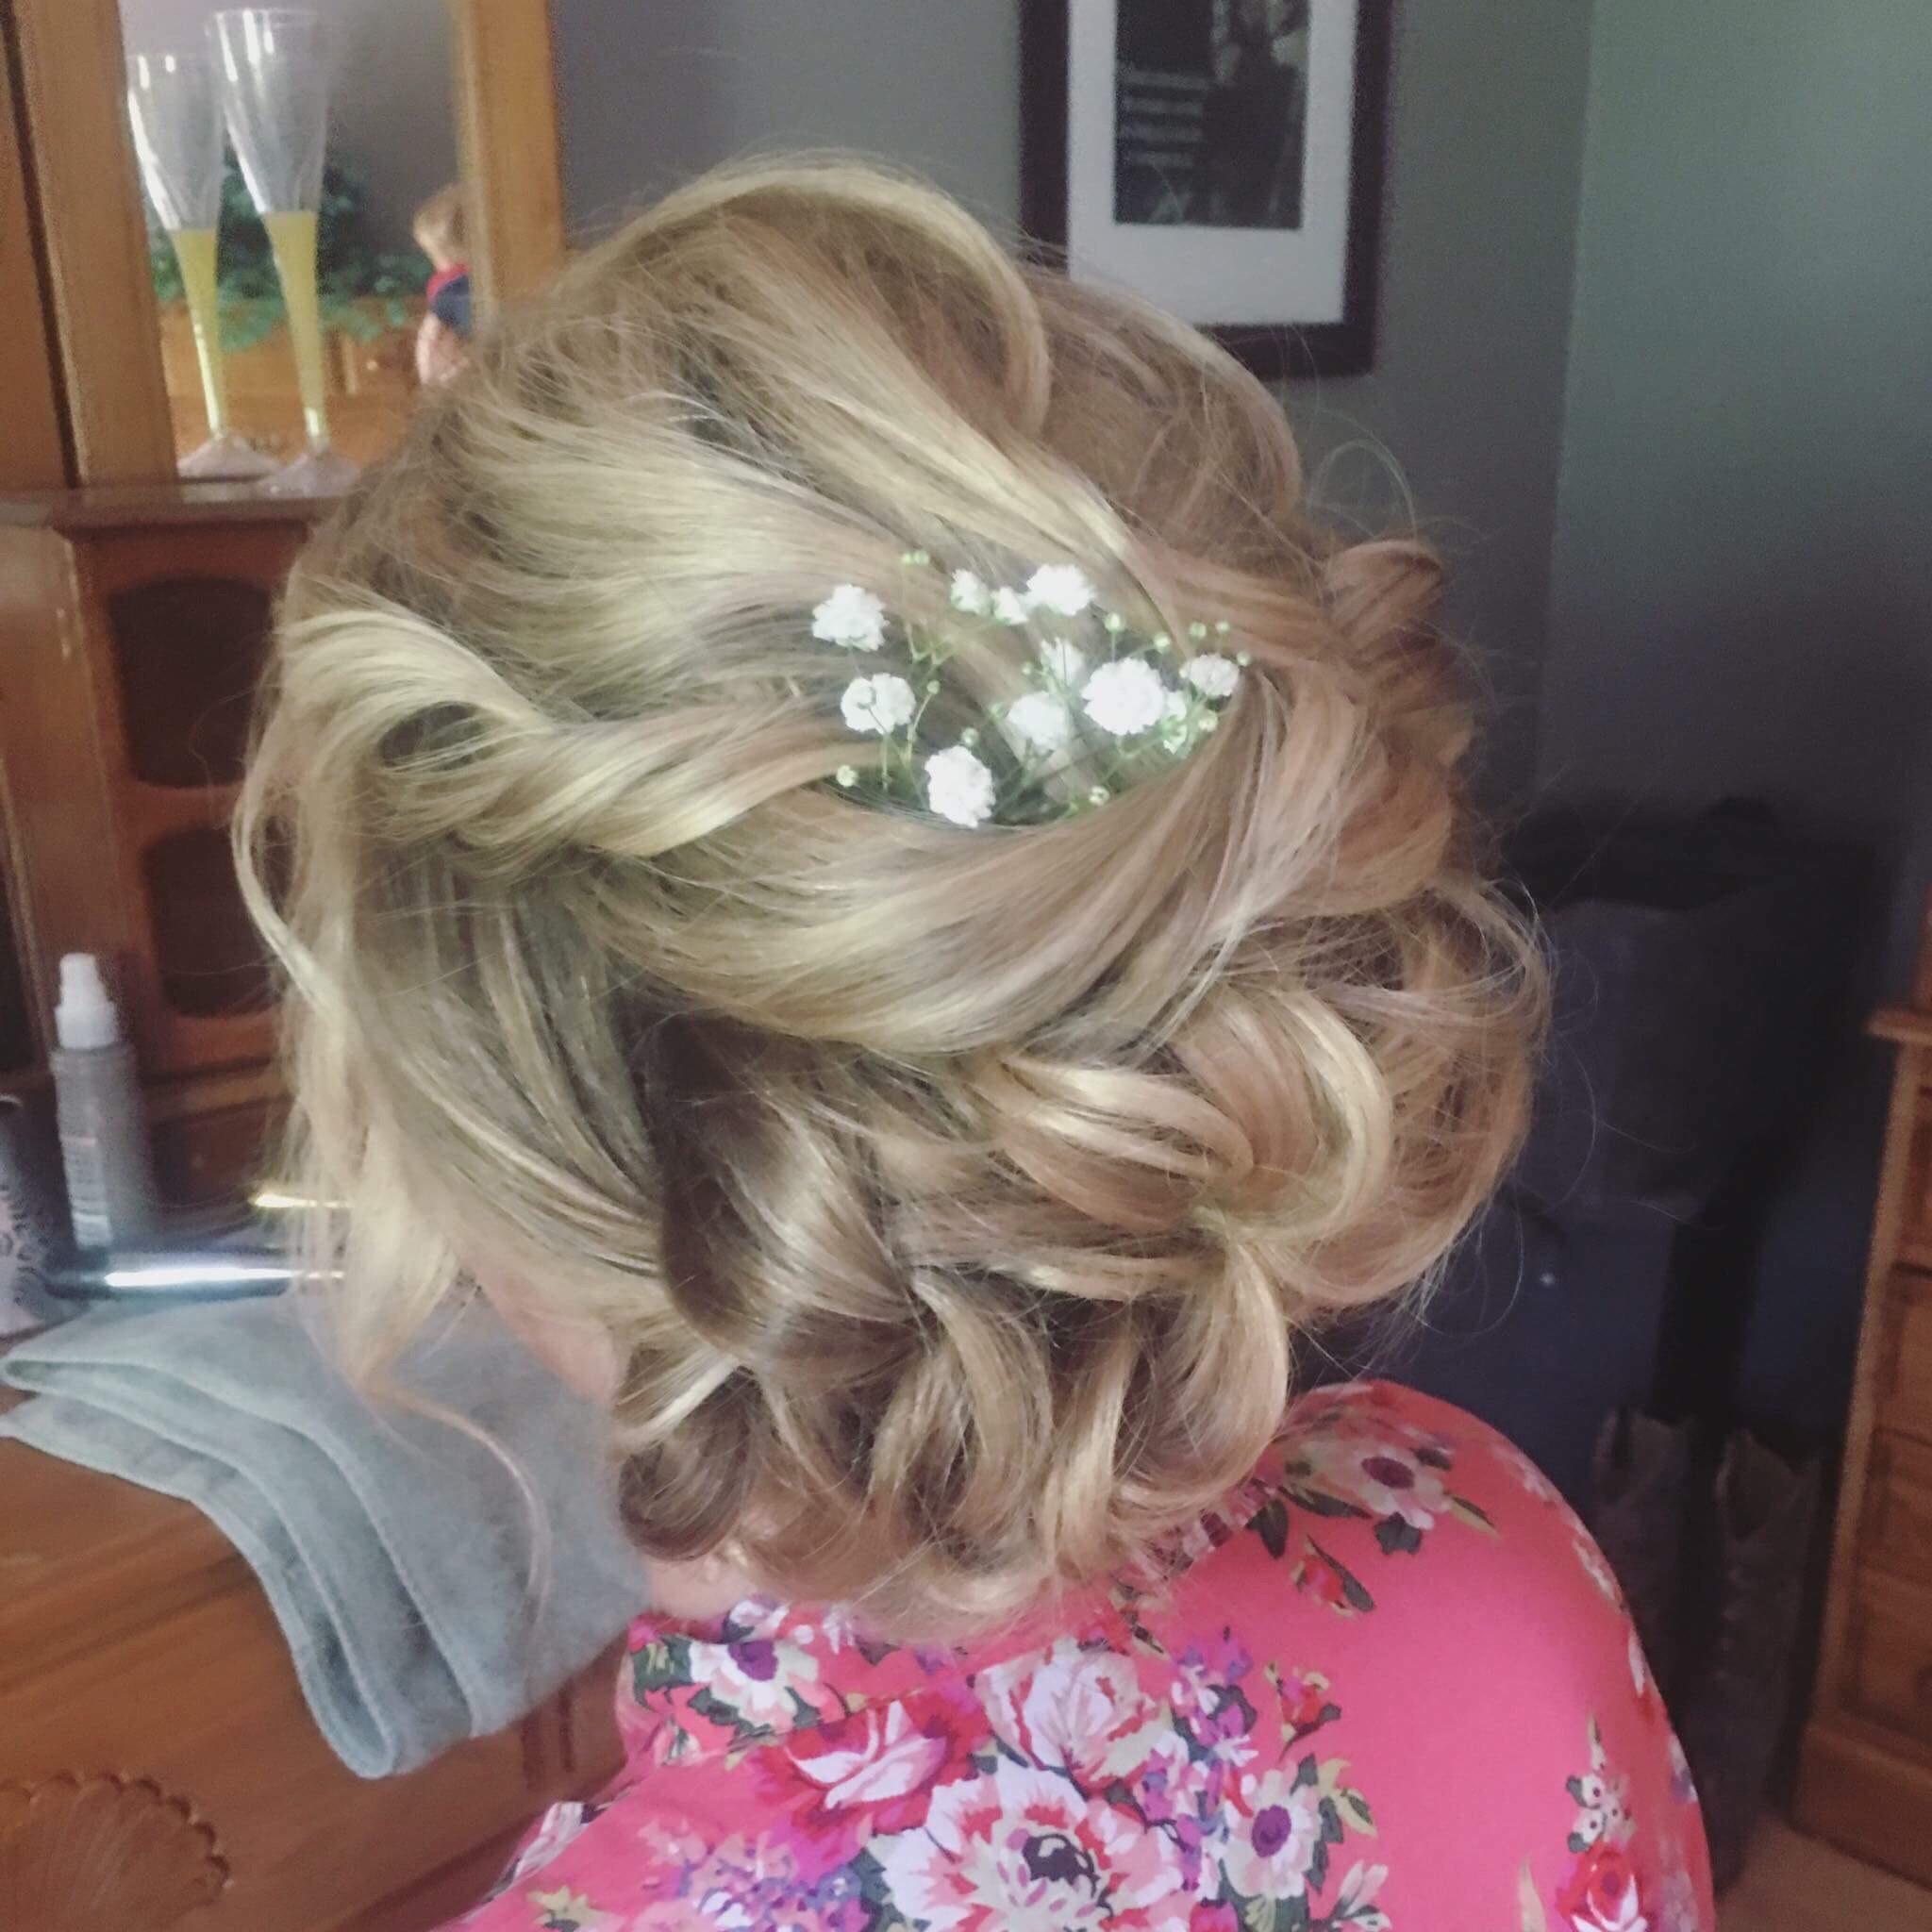 katie_graham_photography_samantha_cooley_fringe_salon_jamestown_new_york_wedding_day_hair_tips_wedding_photography_destination_photographer